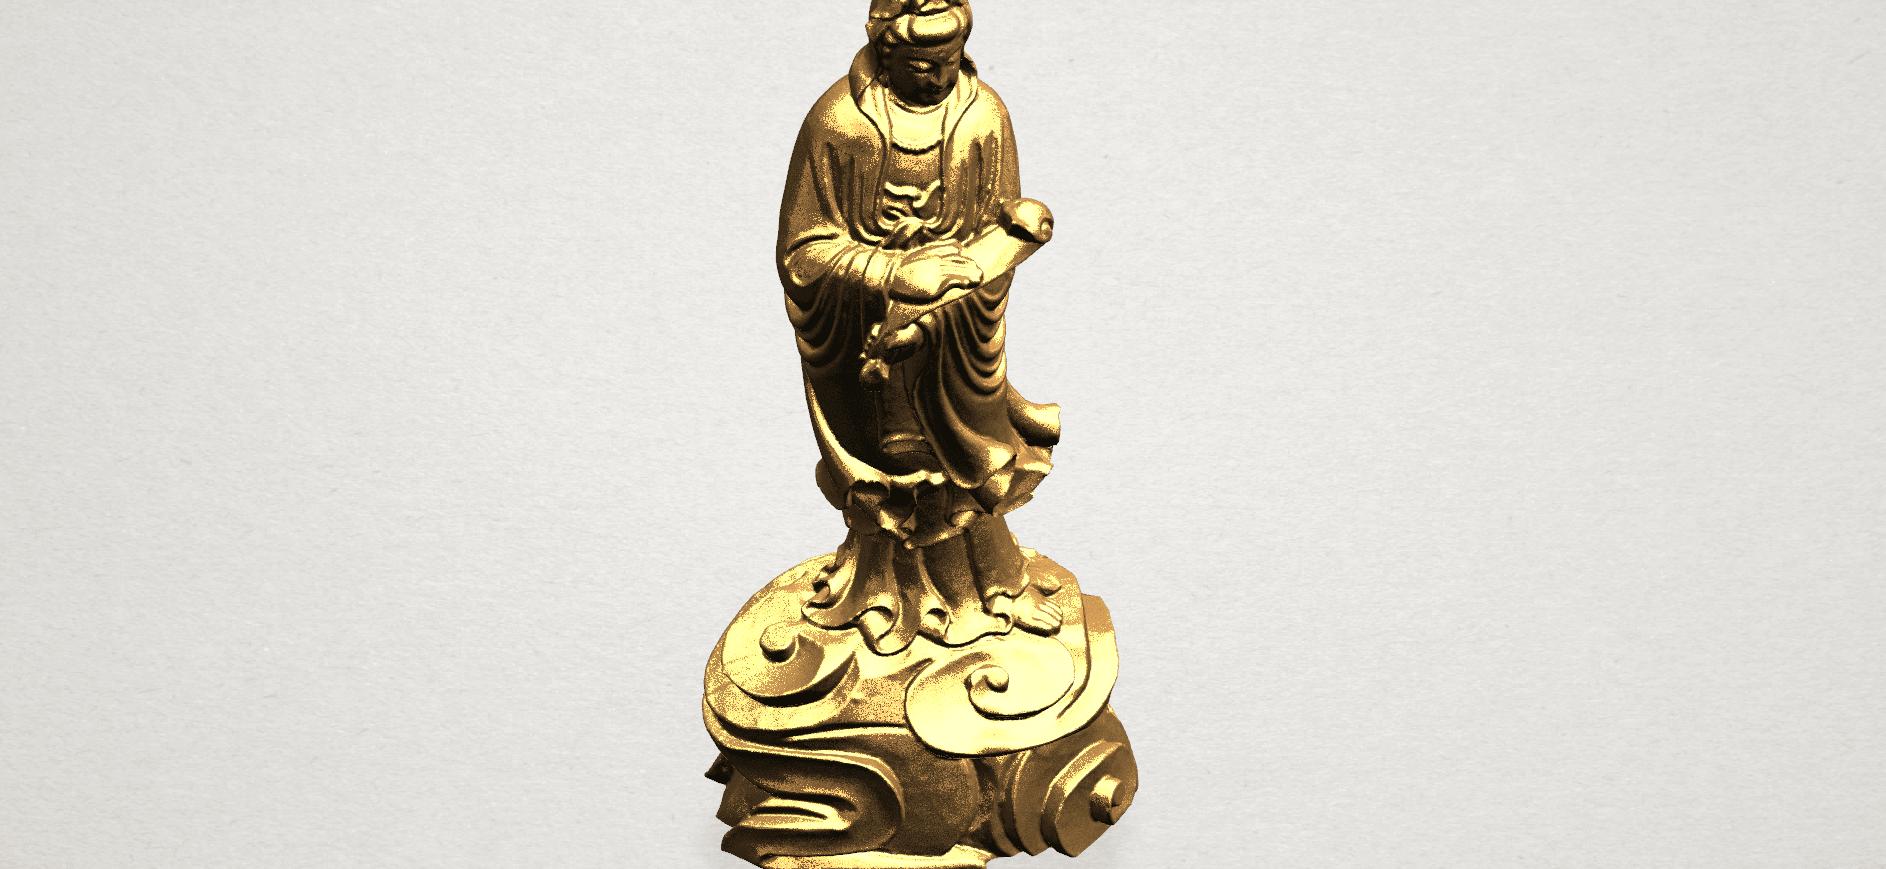 Avalokitesvara Buddha - Standing (iv) A09.png Download free STL file Avalokitesvara Buddha - Standing 04 • 3D print template, GeorgesNikkei